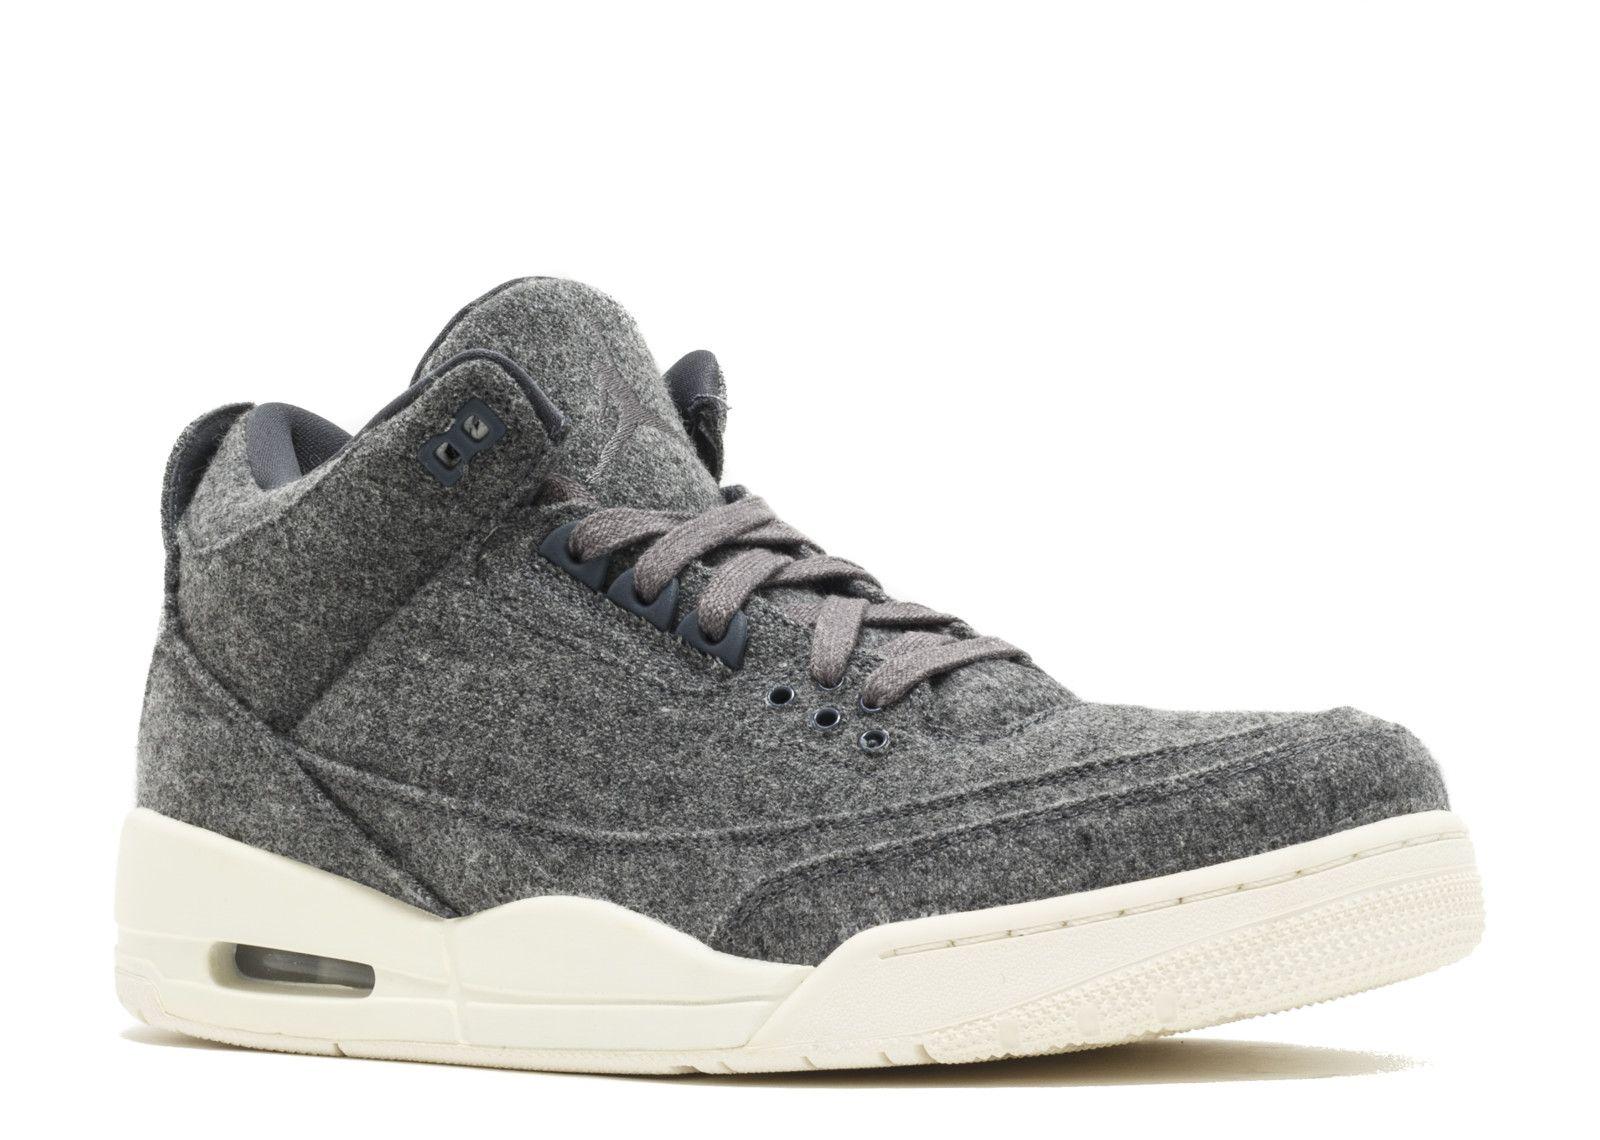 separation shoes 4737a 62bec ... cheapest air jordan 3 retro wool 27a9e 9aa80